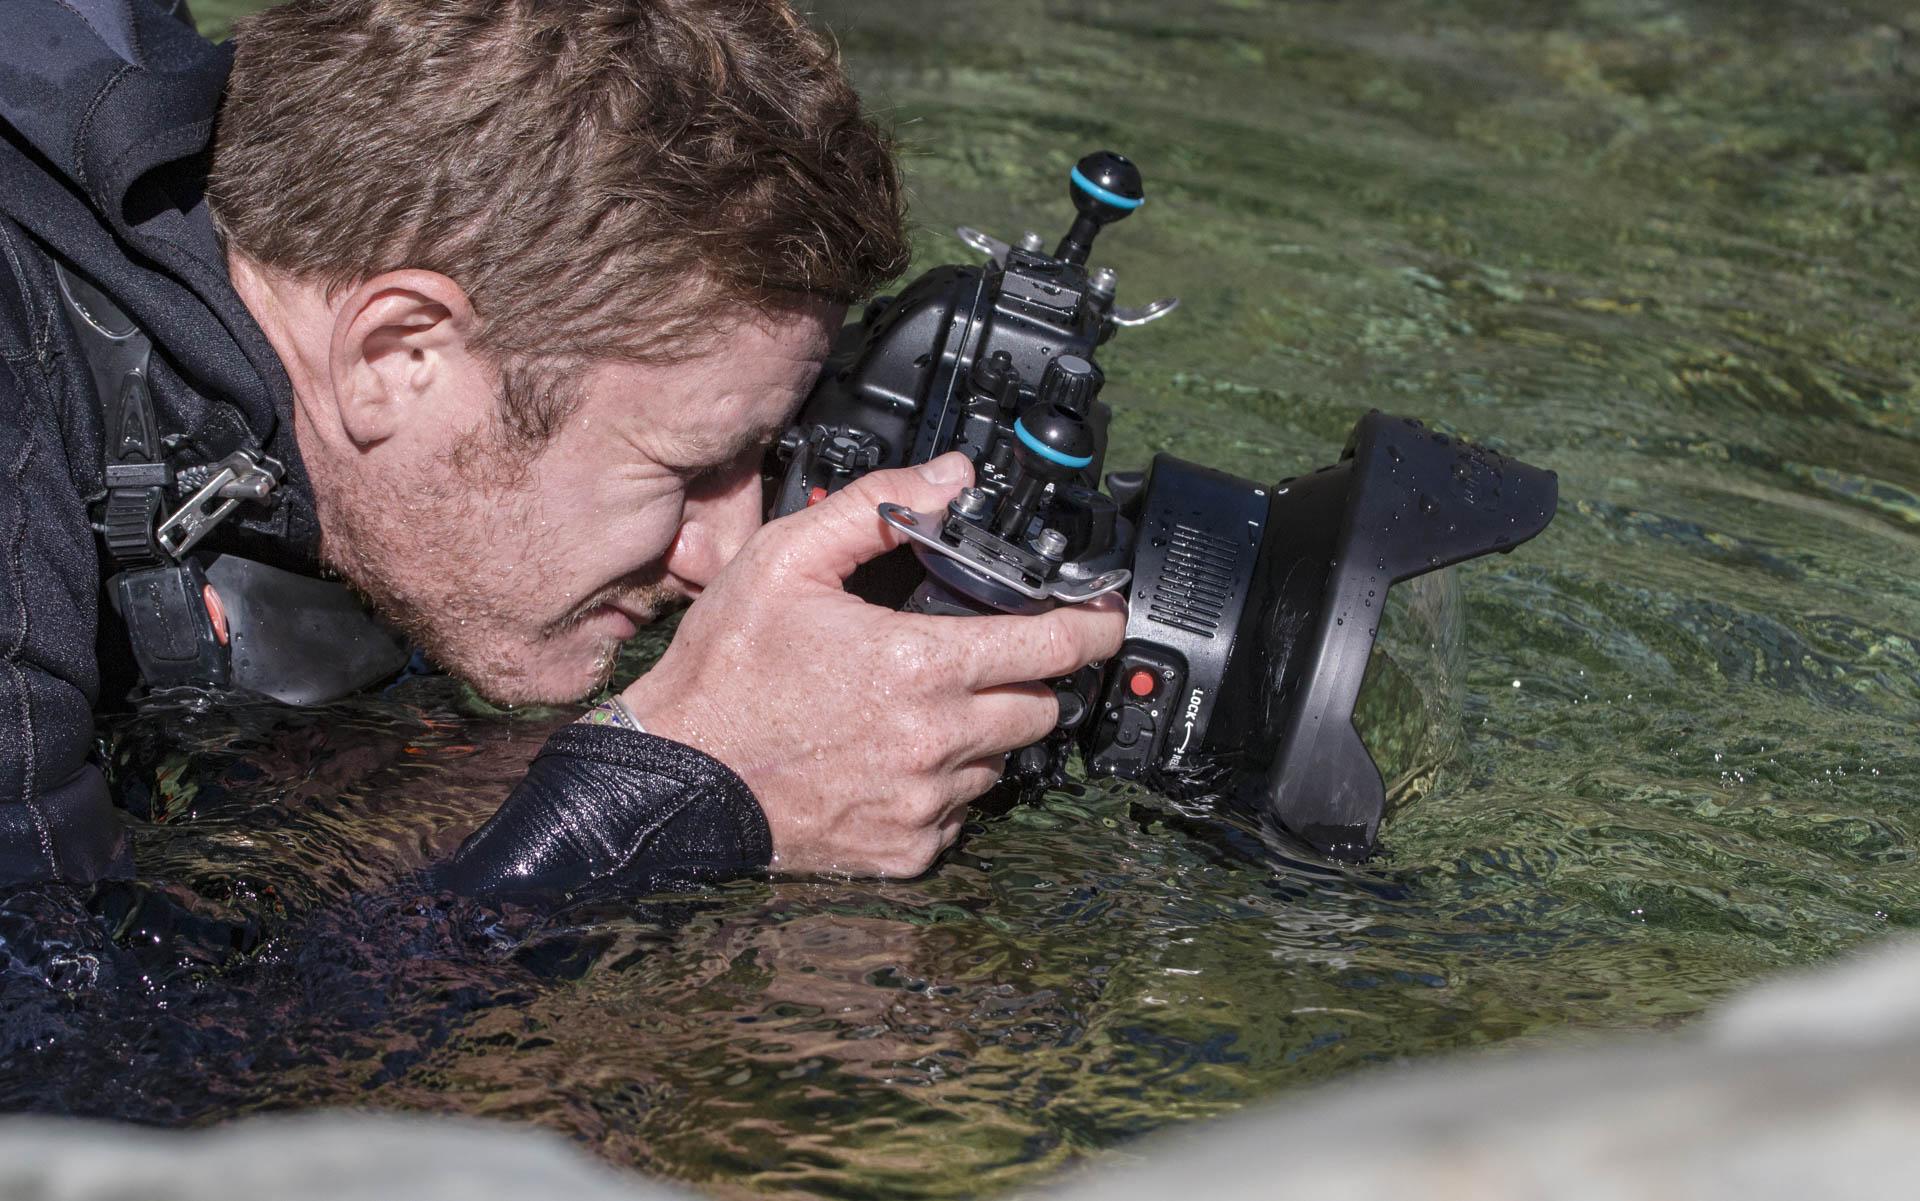 Photographer photographing river scene